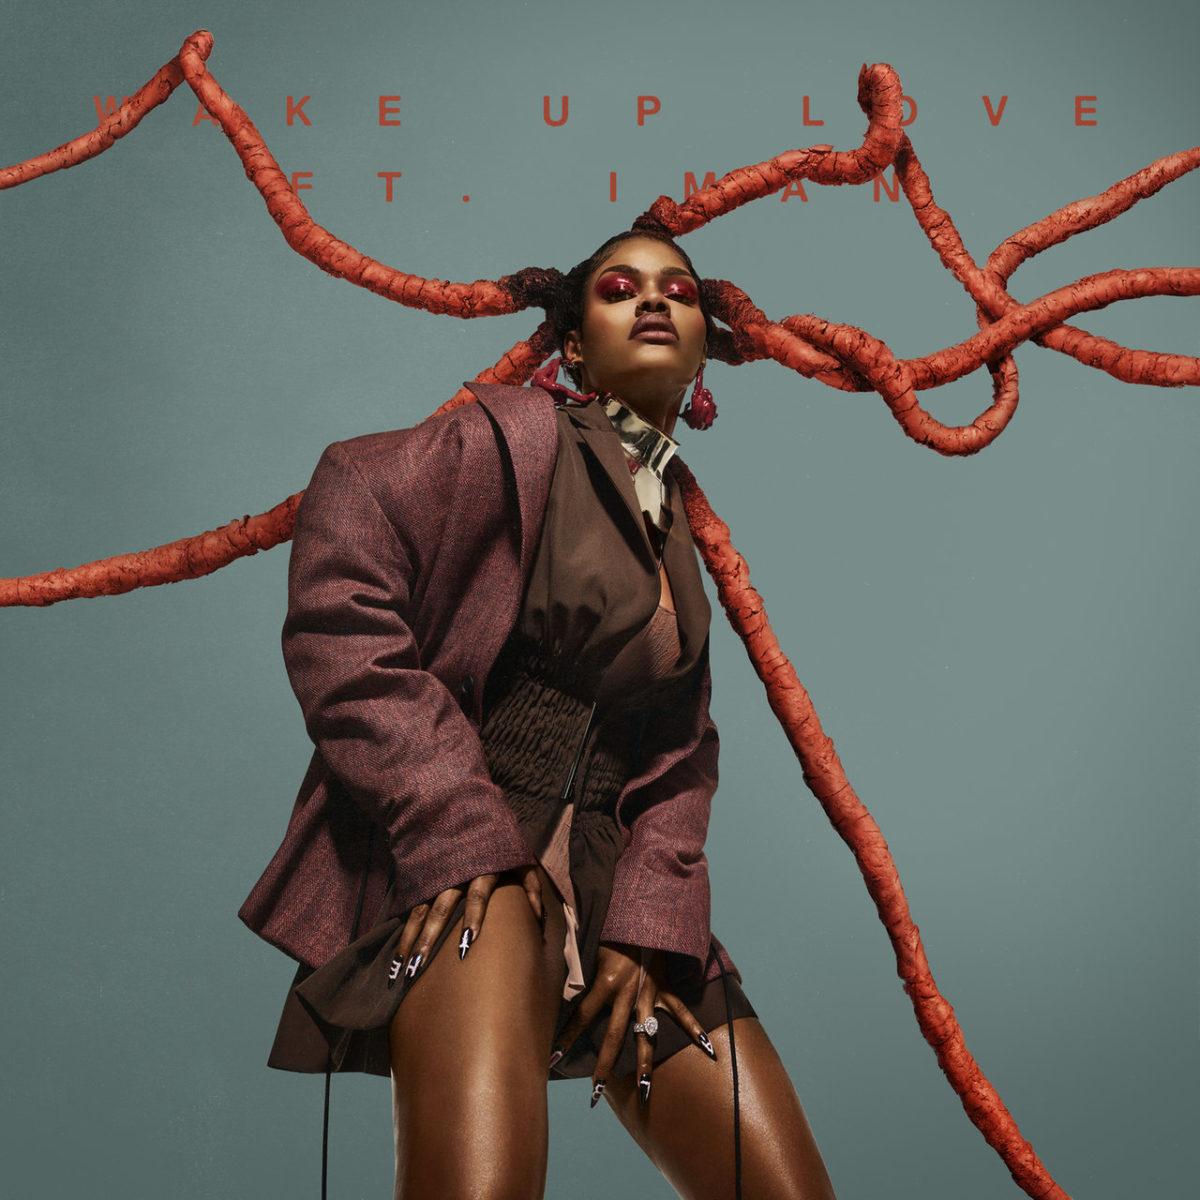 Teyana Taylor - Wake Up Love (ft. Iman) (Cover)